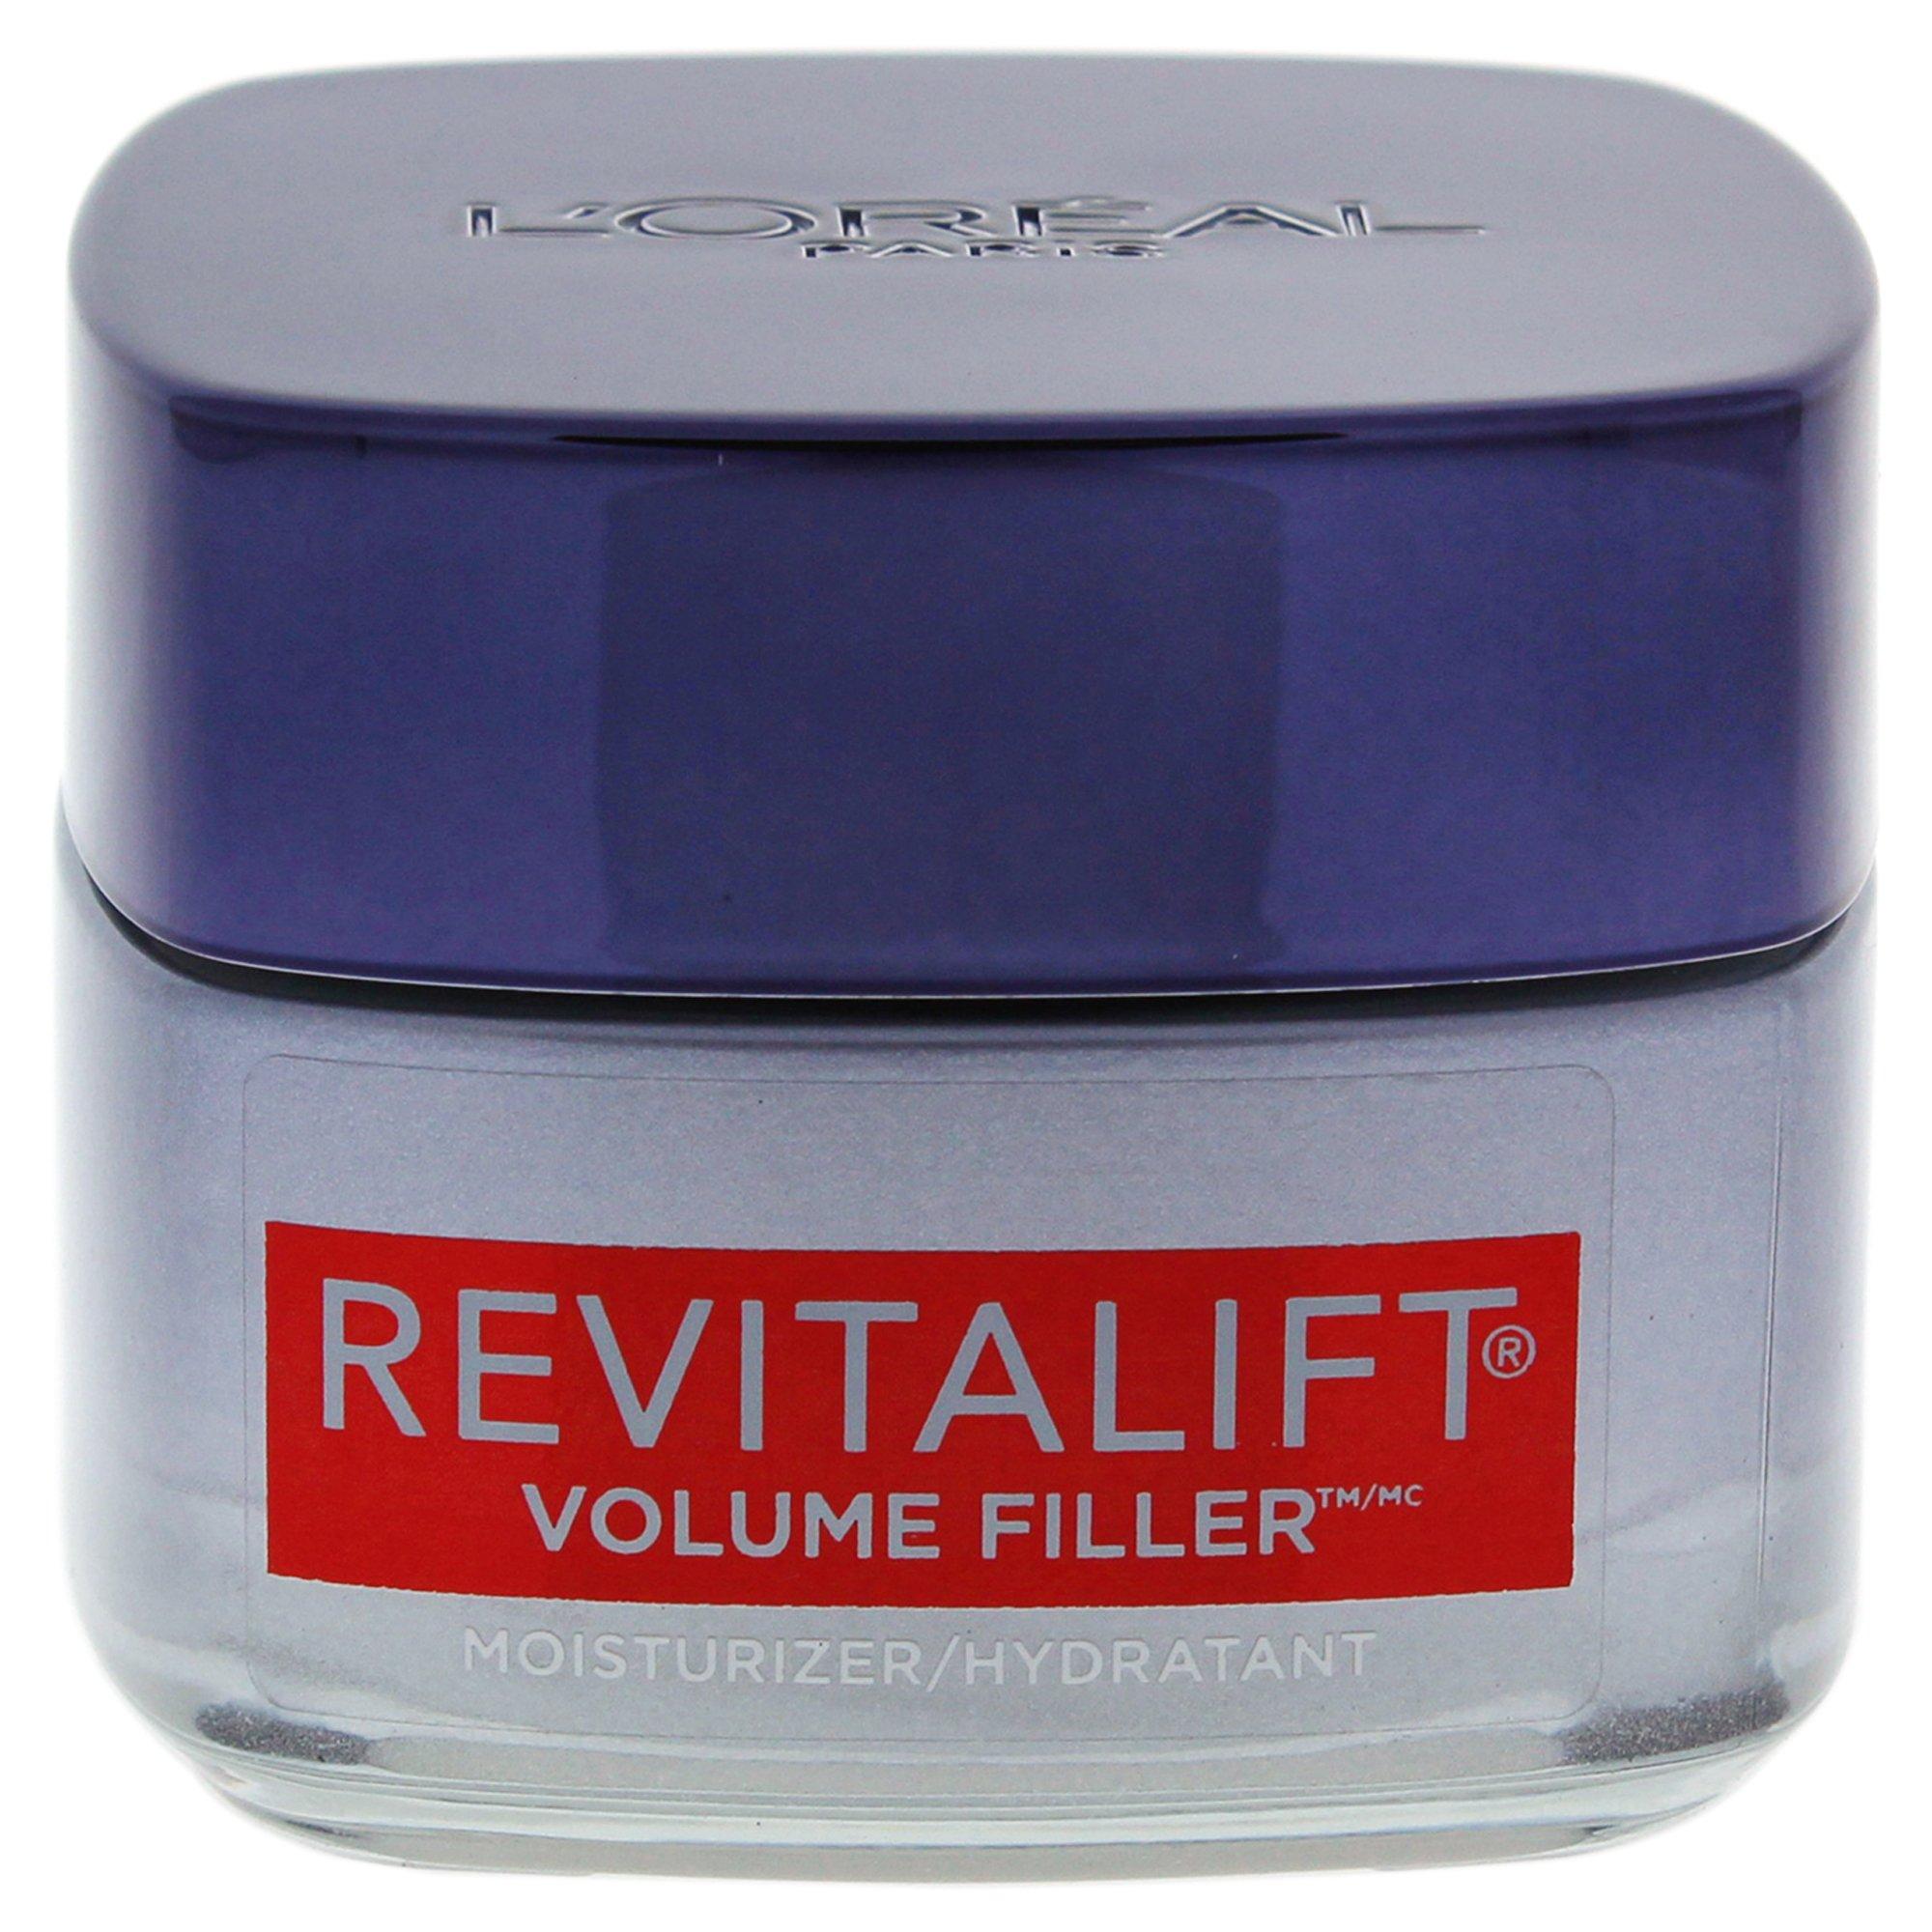 L'Oreal Paris RevitaLift Volume Filler Daily Re-Volumizing Facial Moisturizer